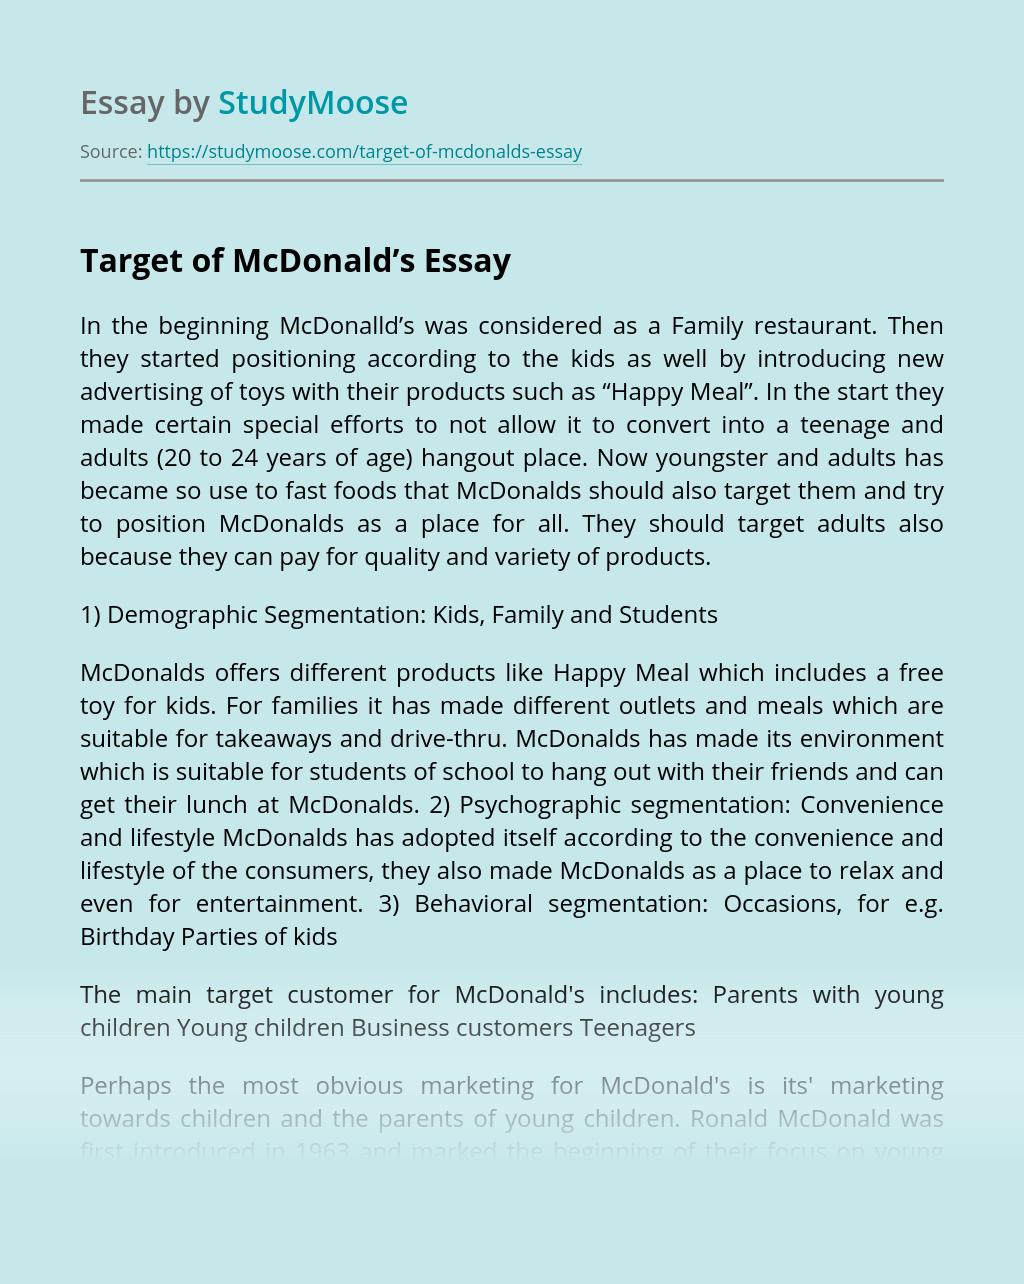 Target of McDonald's